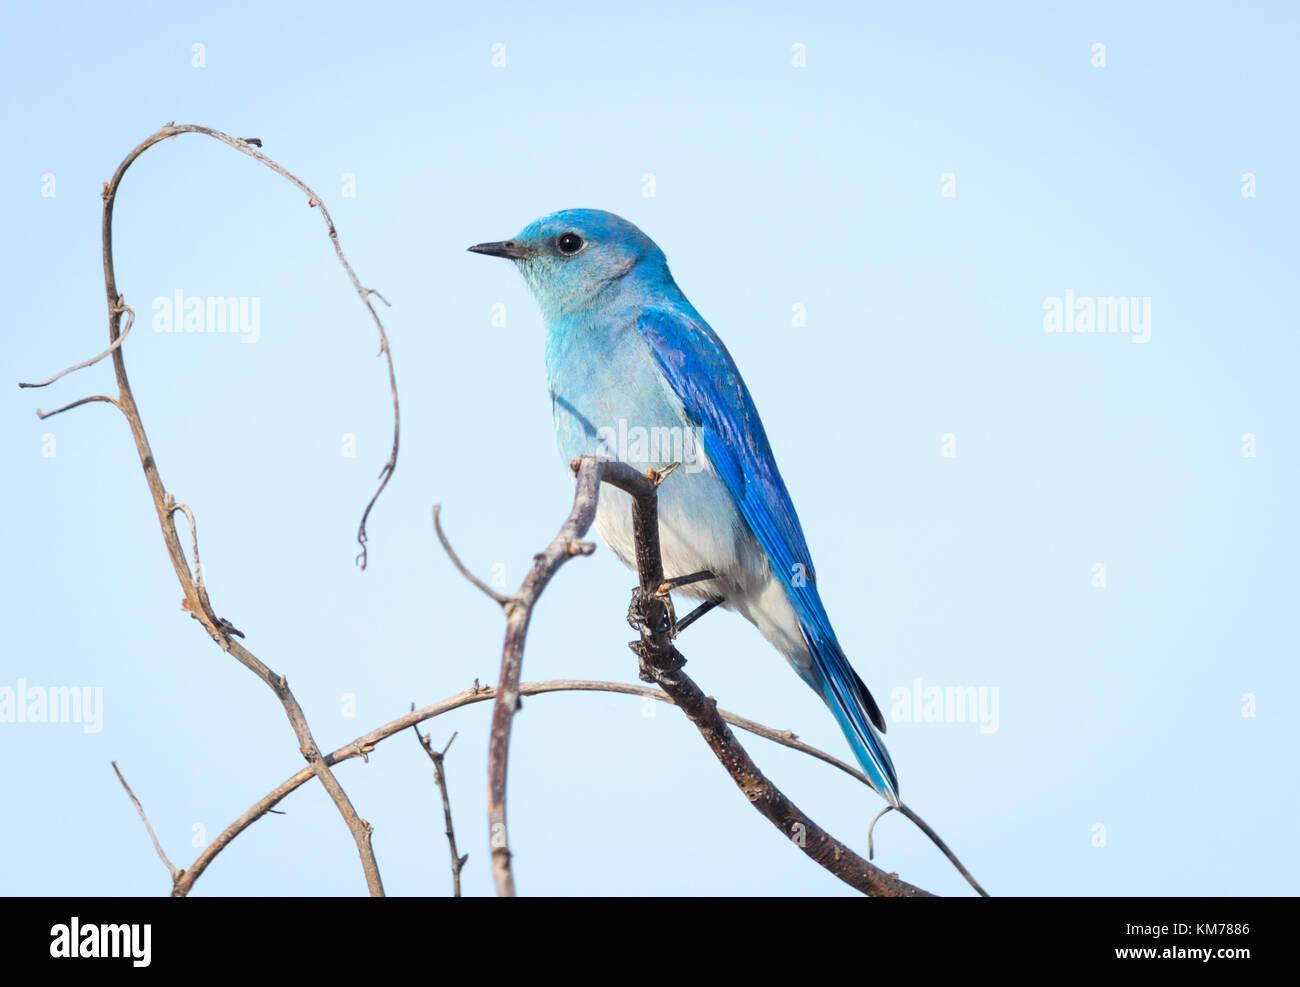 A male Mountain bluebird (Sialia currucoides), in breeding plumage, perched near Tofield, Alberta, Canada. Stock Photo